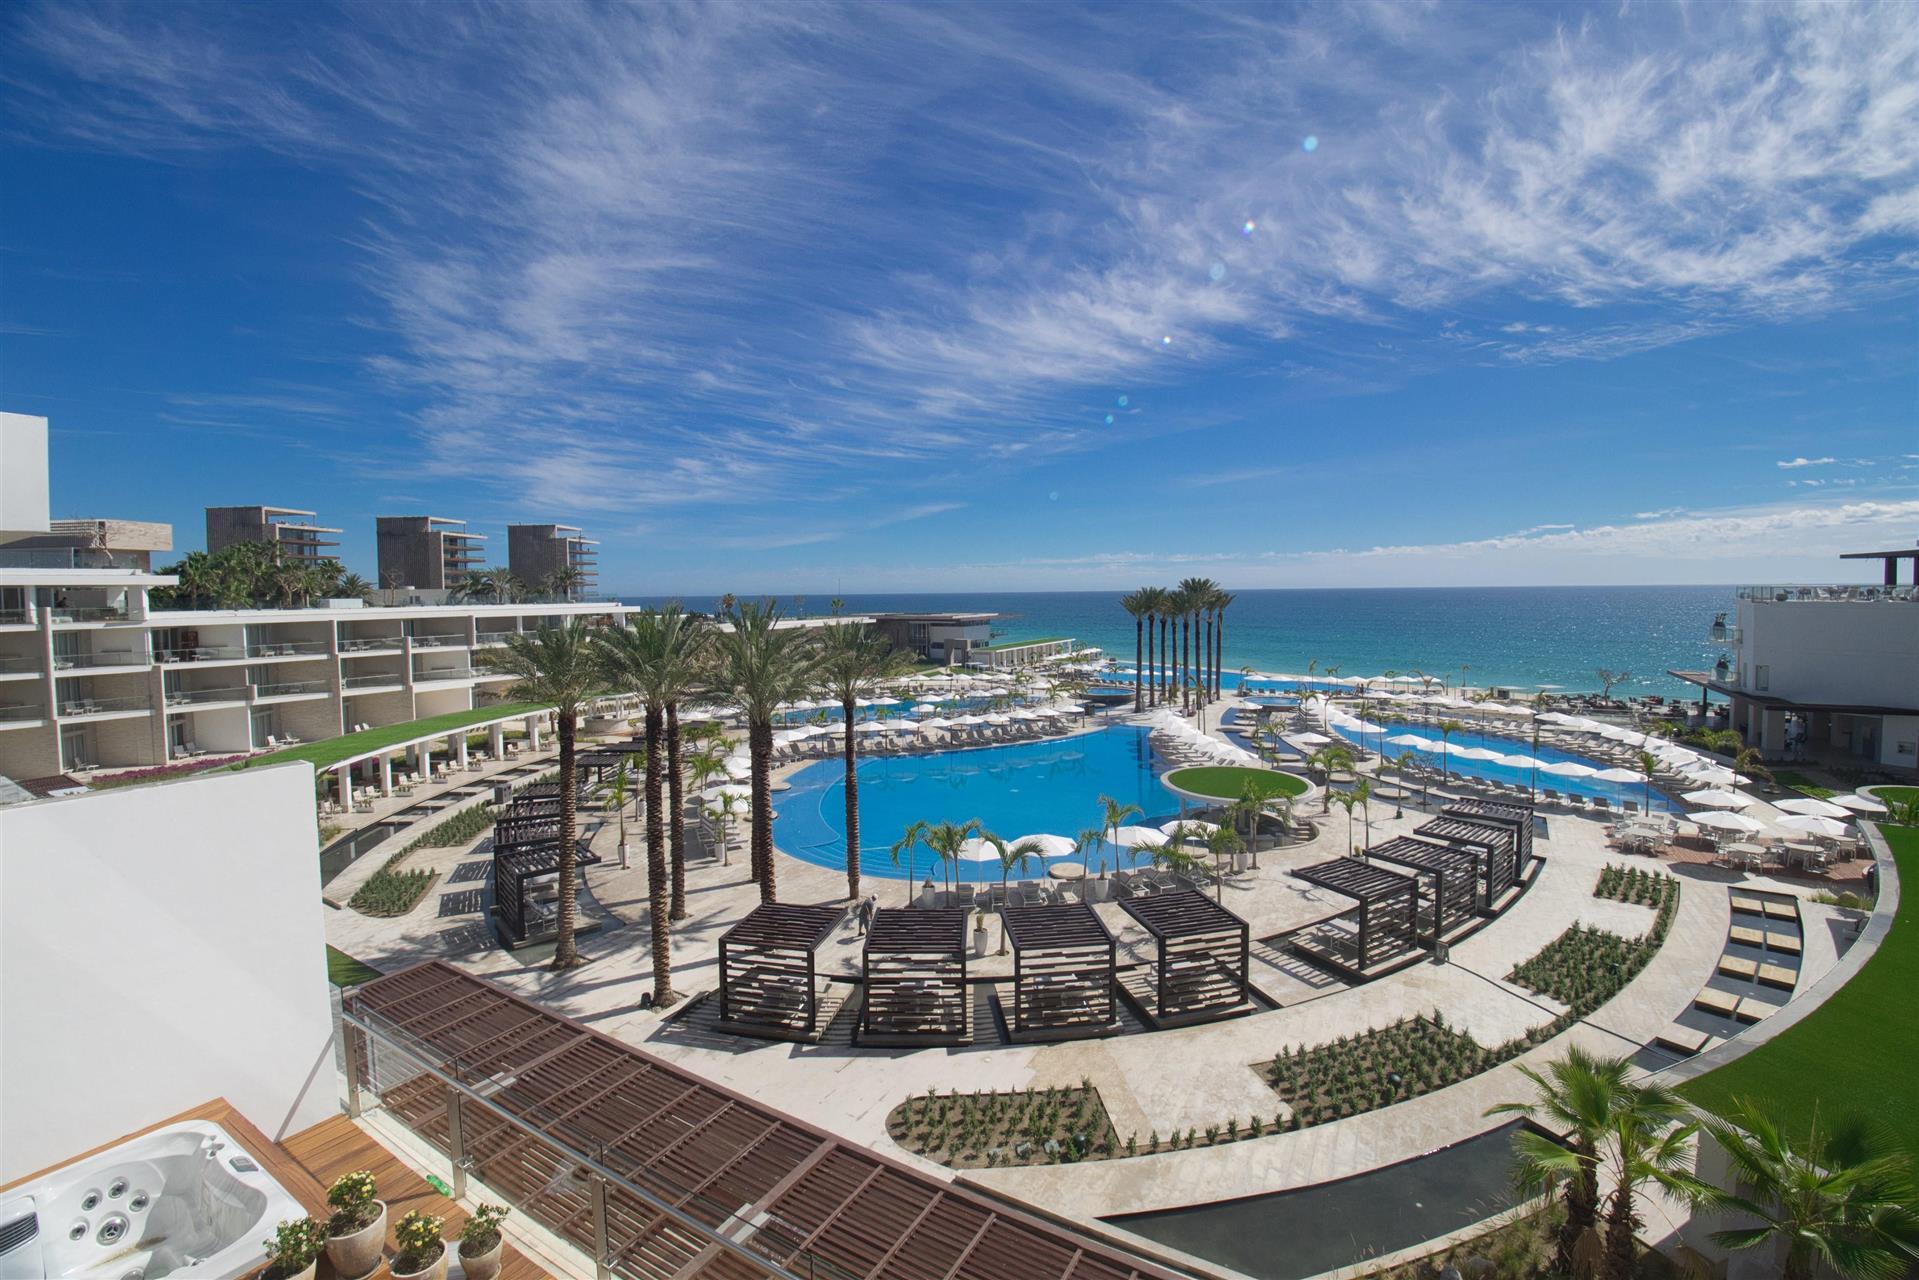 Honeymoons at Le Blanc Spa Resort Los Cabos San Lucas Mexico